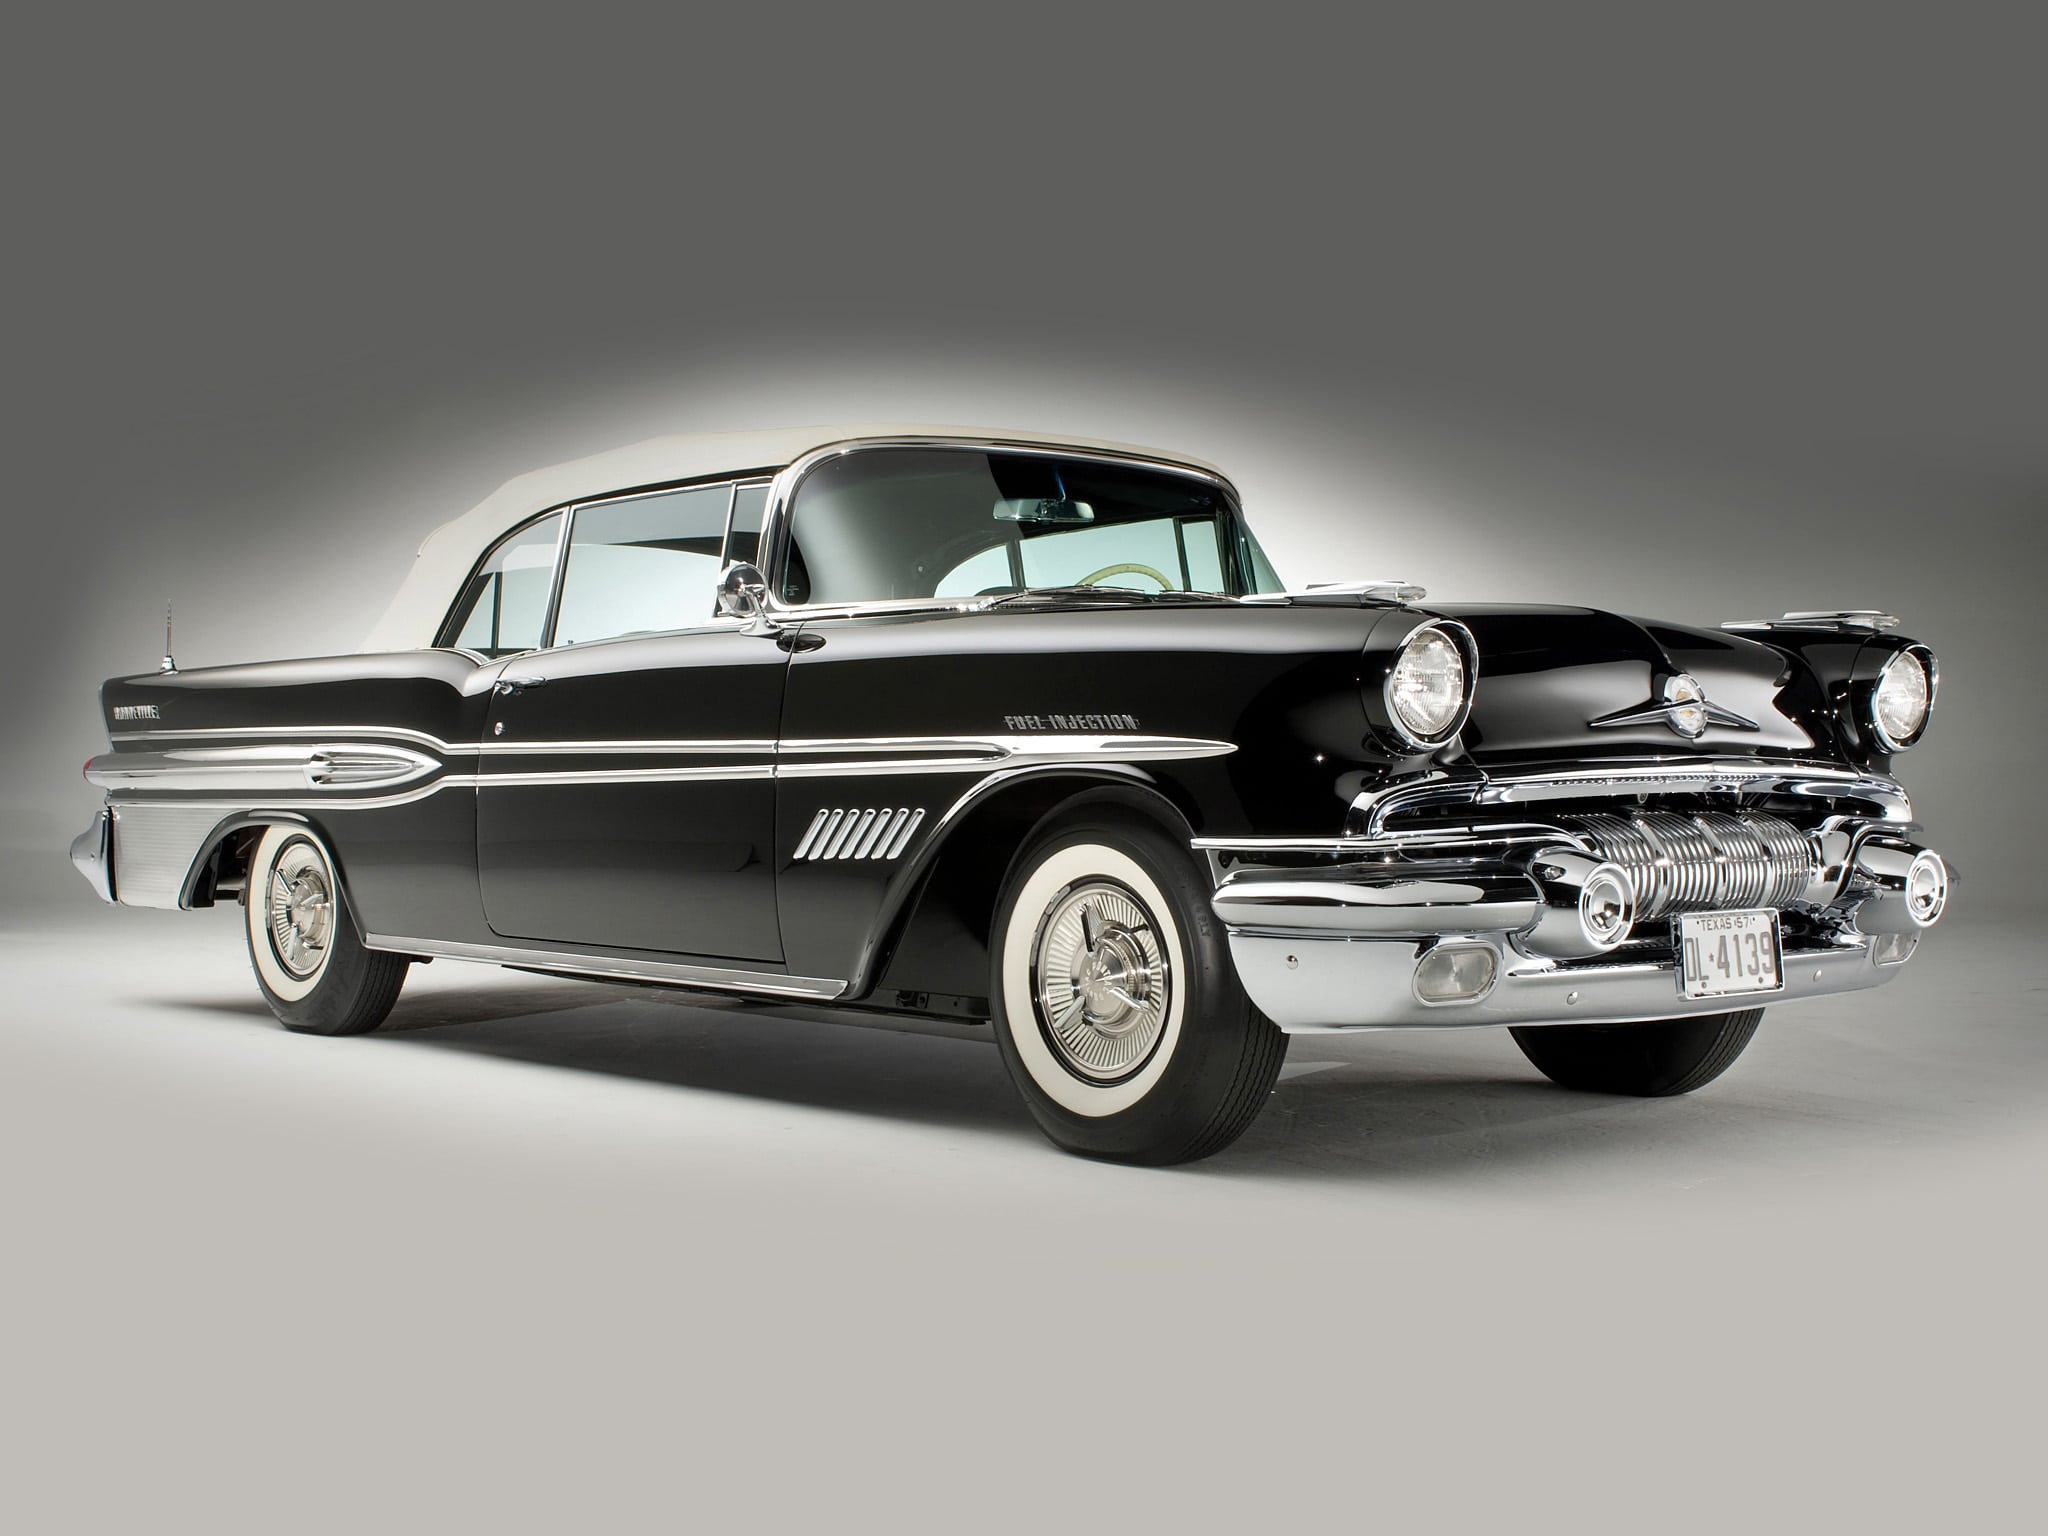 1957 Pontiac Star Chief Custom Bonneville Wallpapers